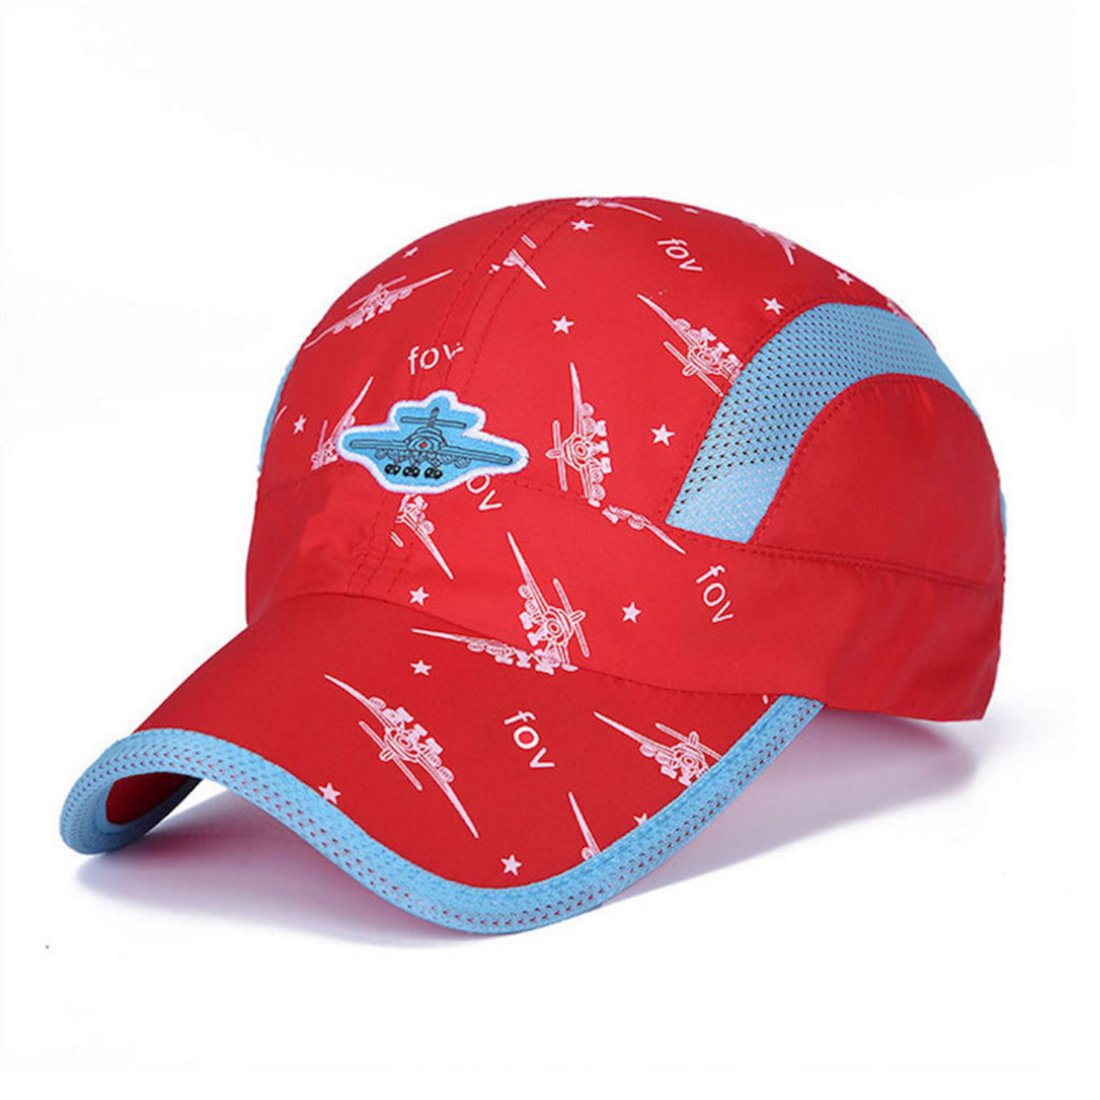 690d74255497c Eleganty Kids Quick Drying Sun Hat Adjustable Airy Mesh UV Boys Girls Protection  Caps